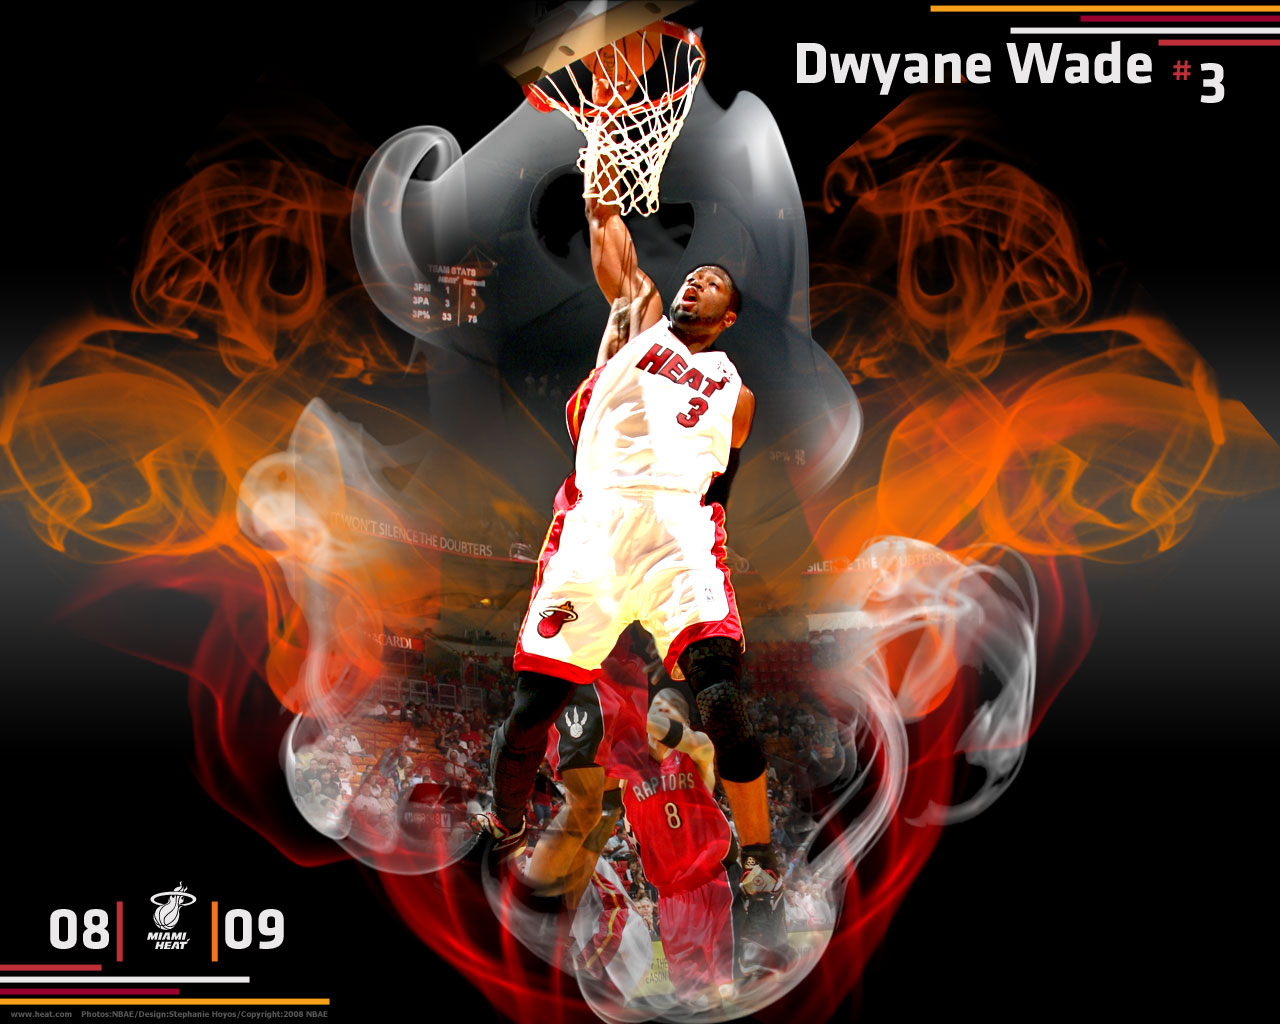 dwyane wade heart basketball dwyane wade miami heat dwyane wade 1280x1024